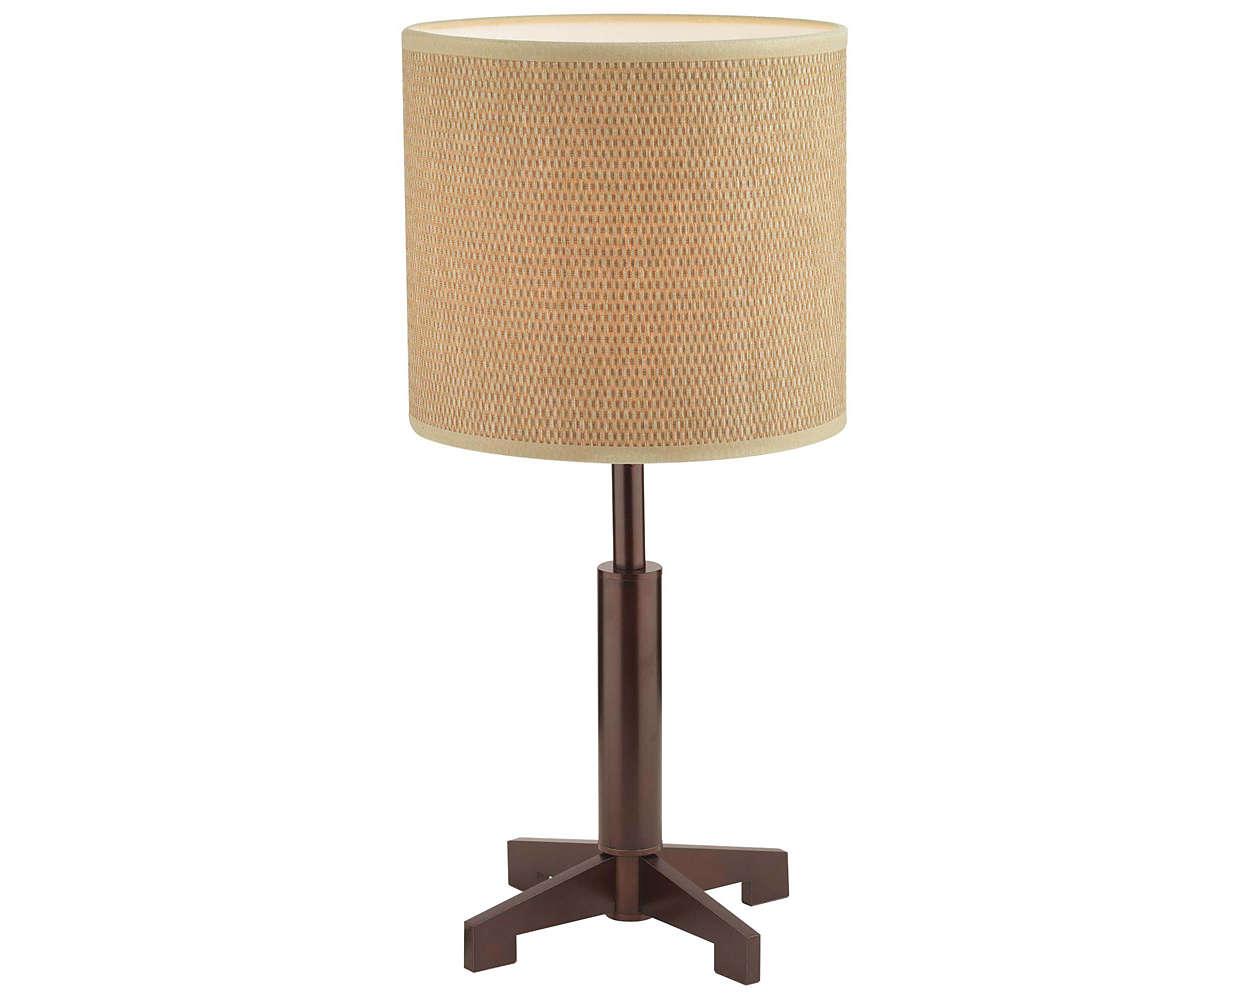 Fisher Island 1-light Table Lamp, Merlot Bronze